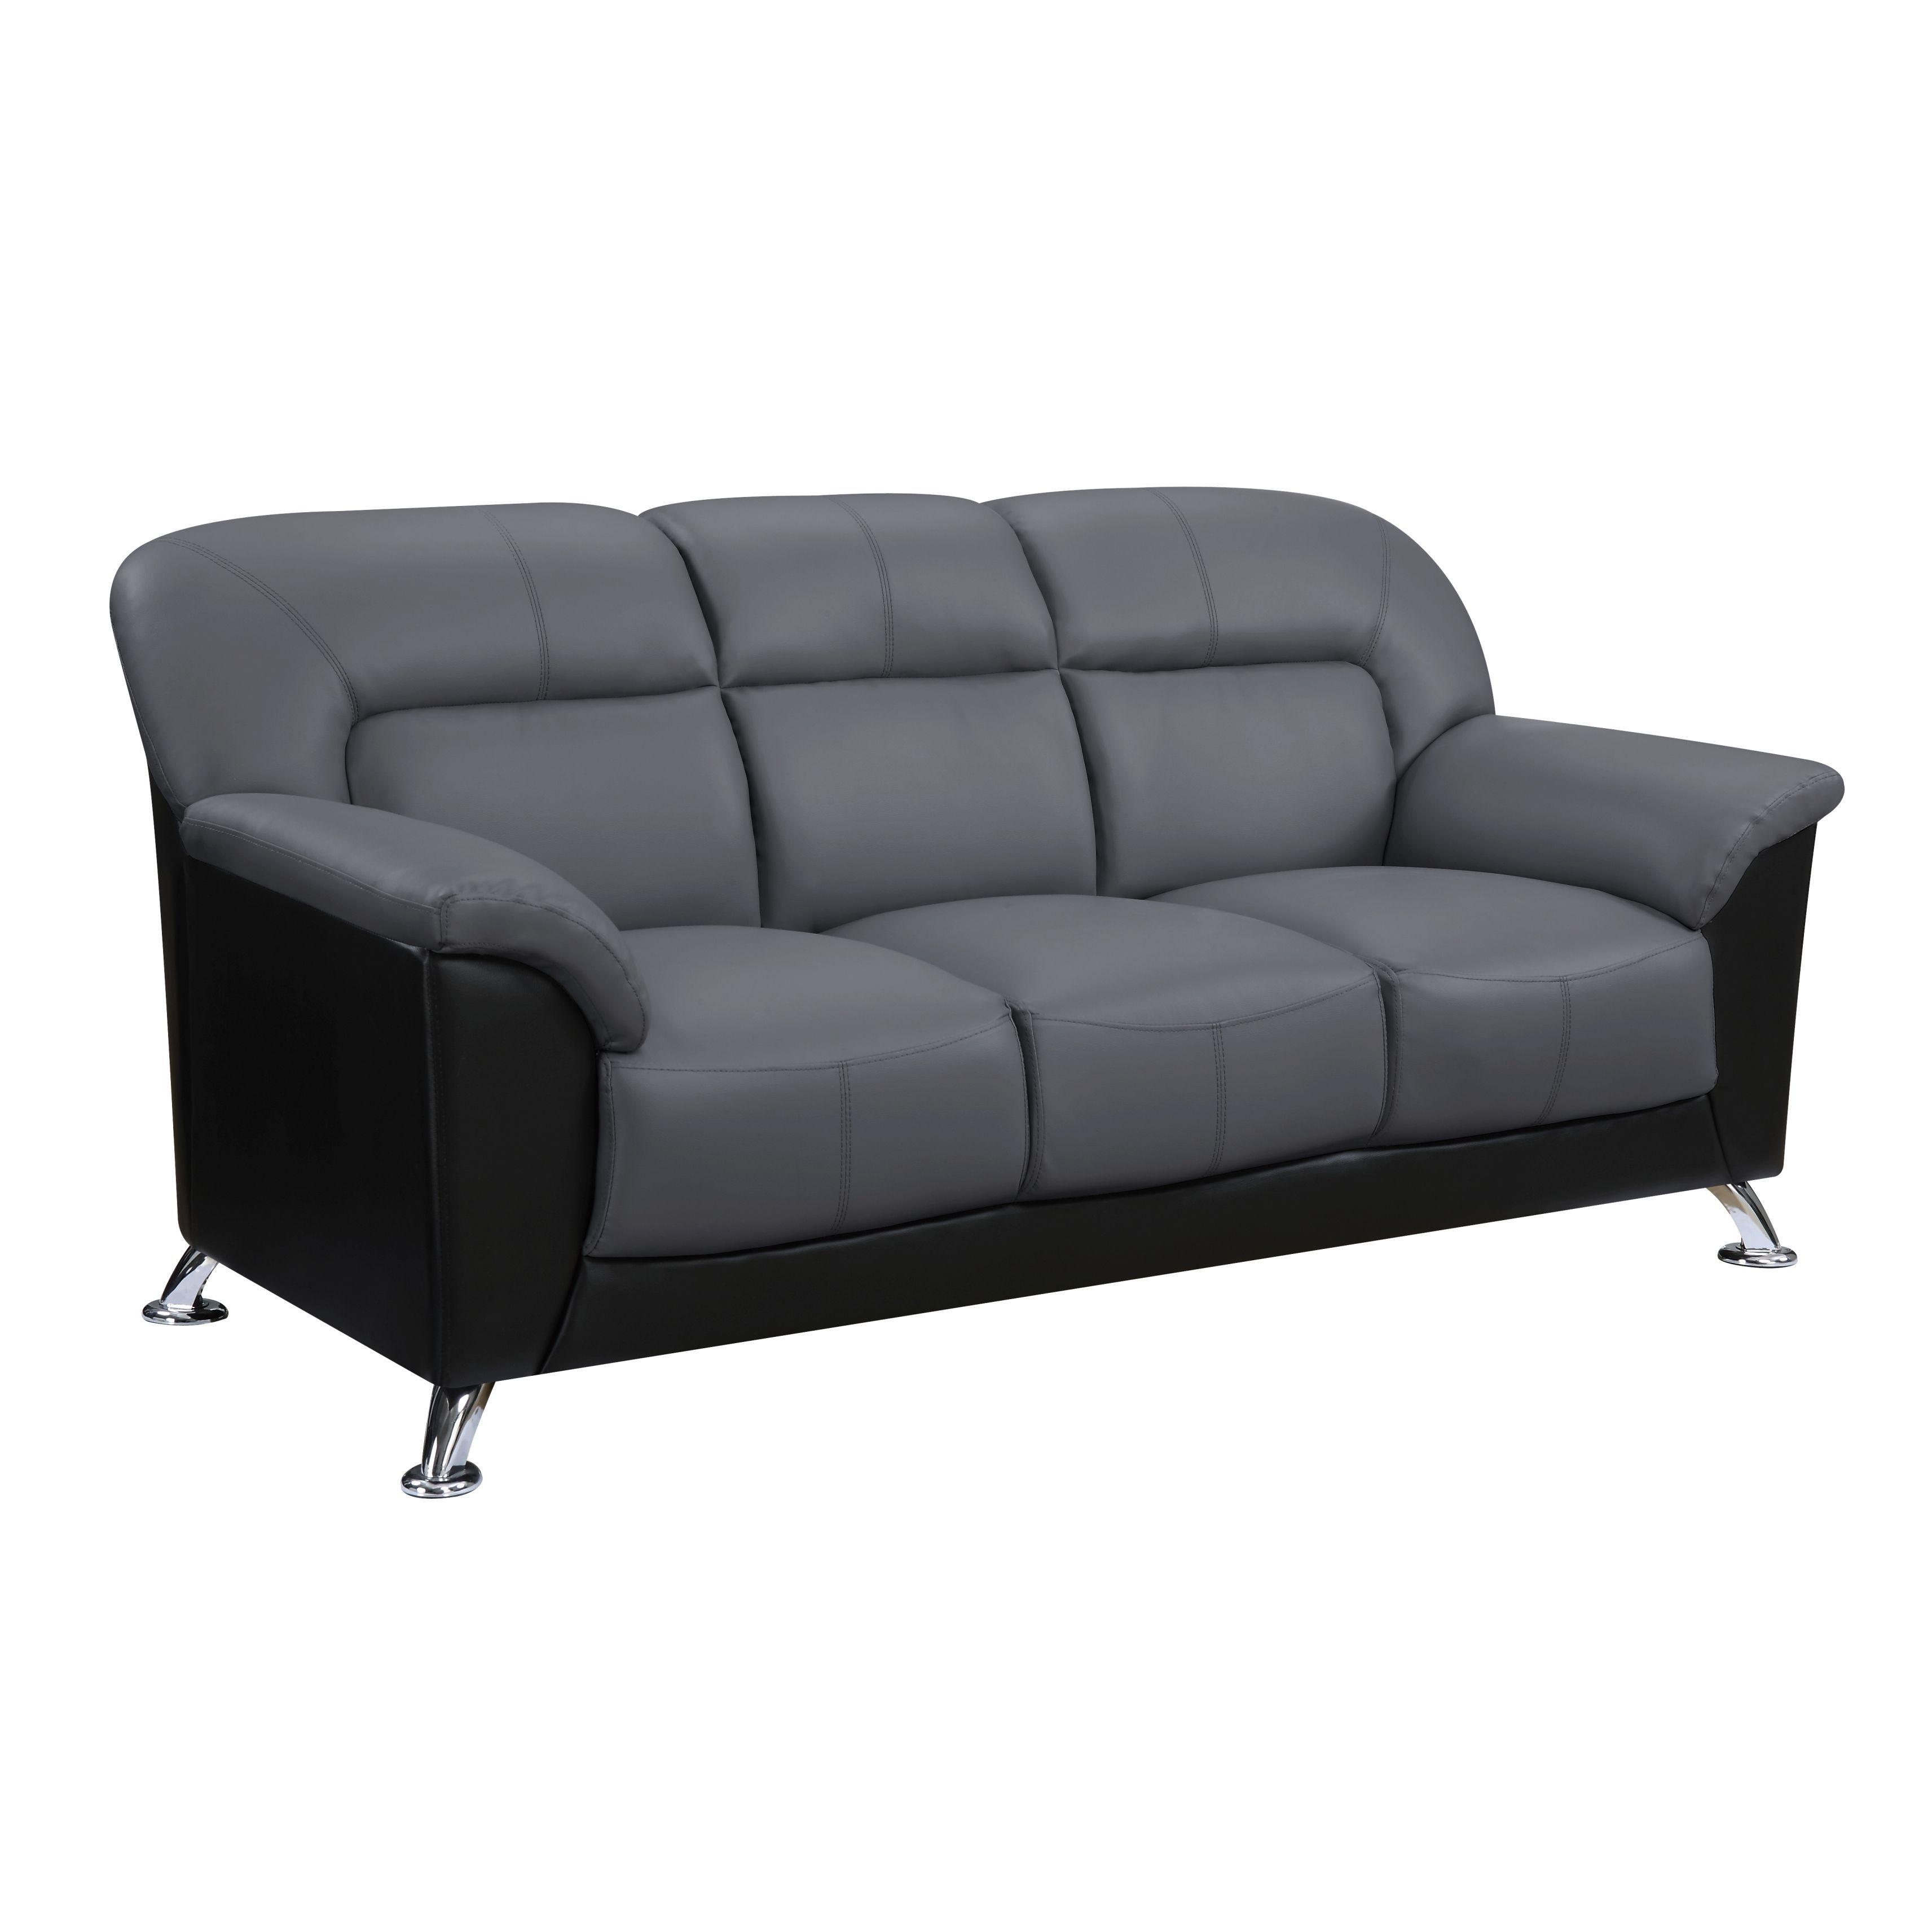 USA Global Furniture Dark Grey Fabric Black Faux Leather Sofa (Sofa Dark  Grey/Black